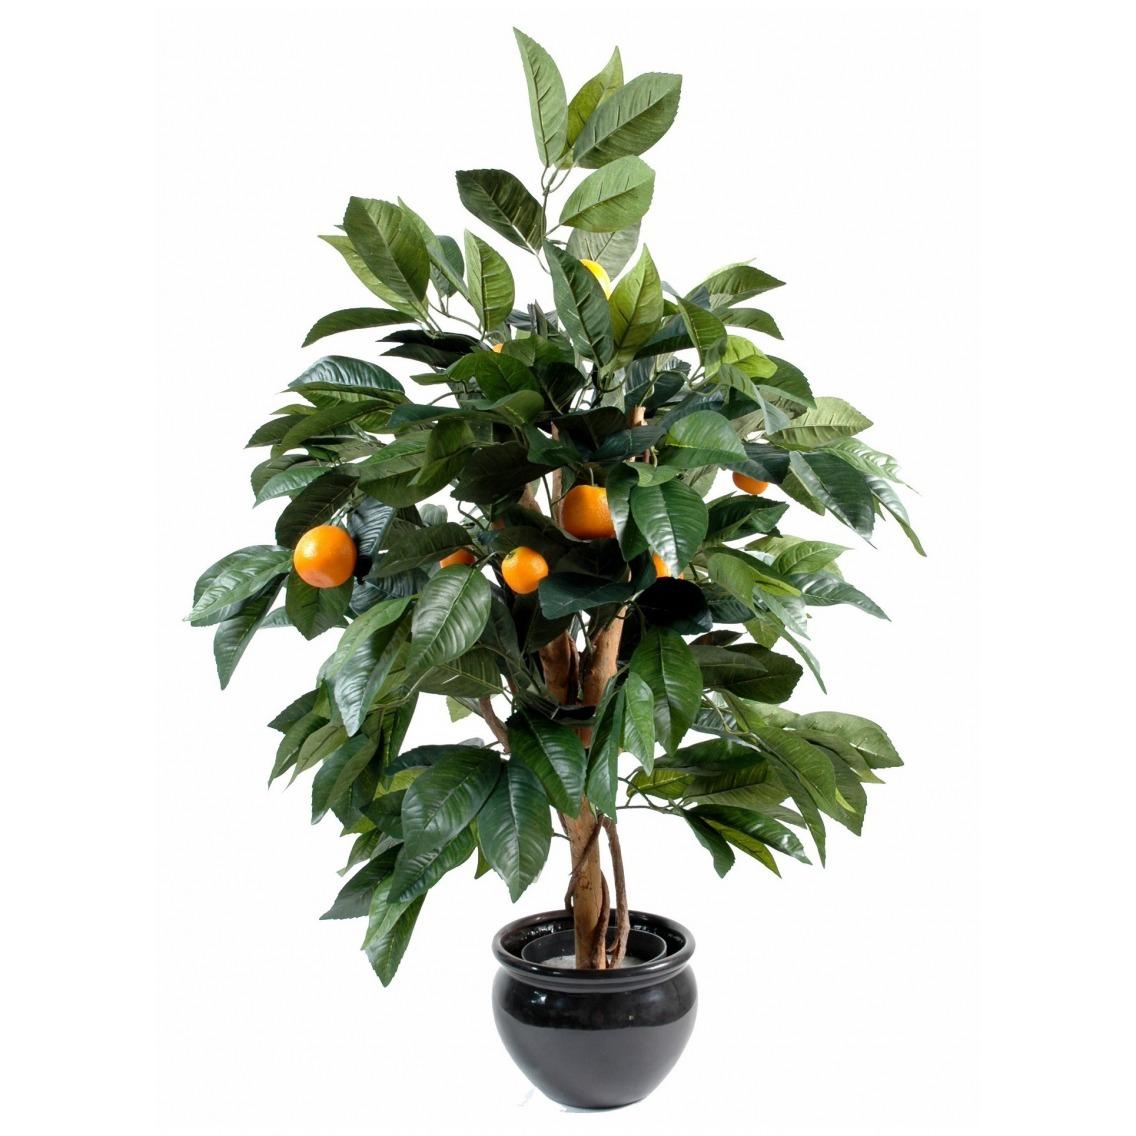 Oranger artificiel arbuste 80 cm arbres fruitiers for Arbuste plastique